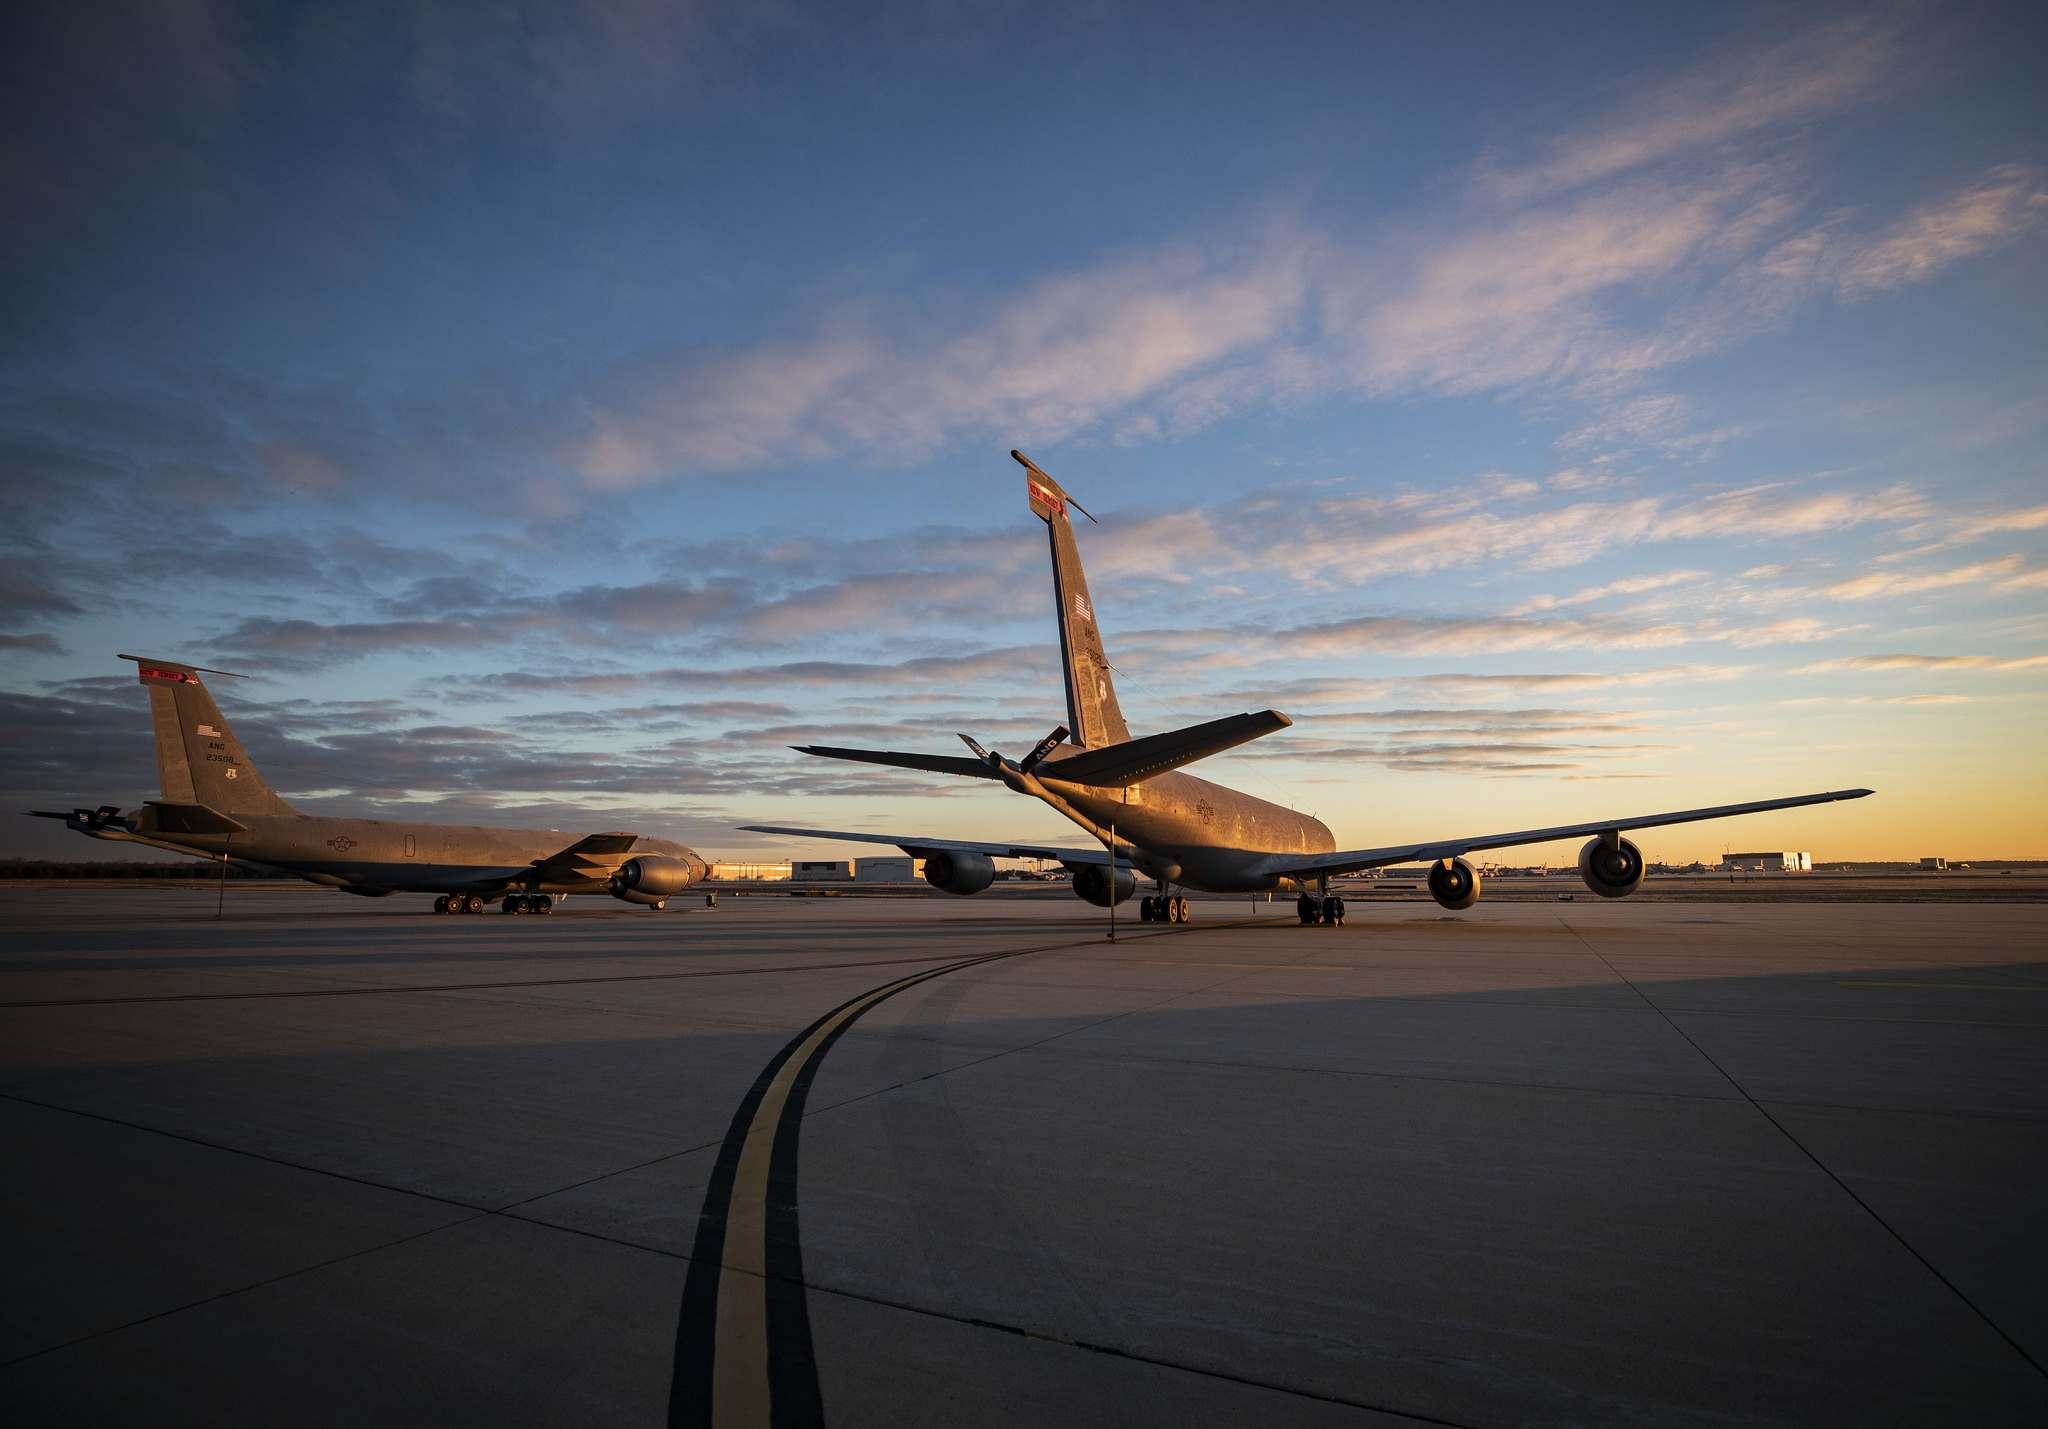 boeing kc 1354 Boeing KC 135R Stratotanker Photos